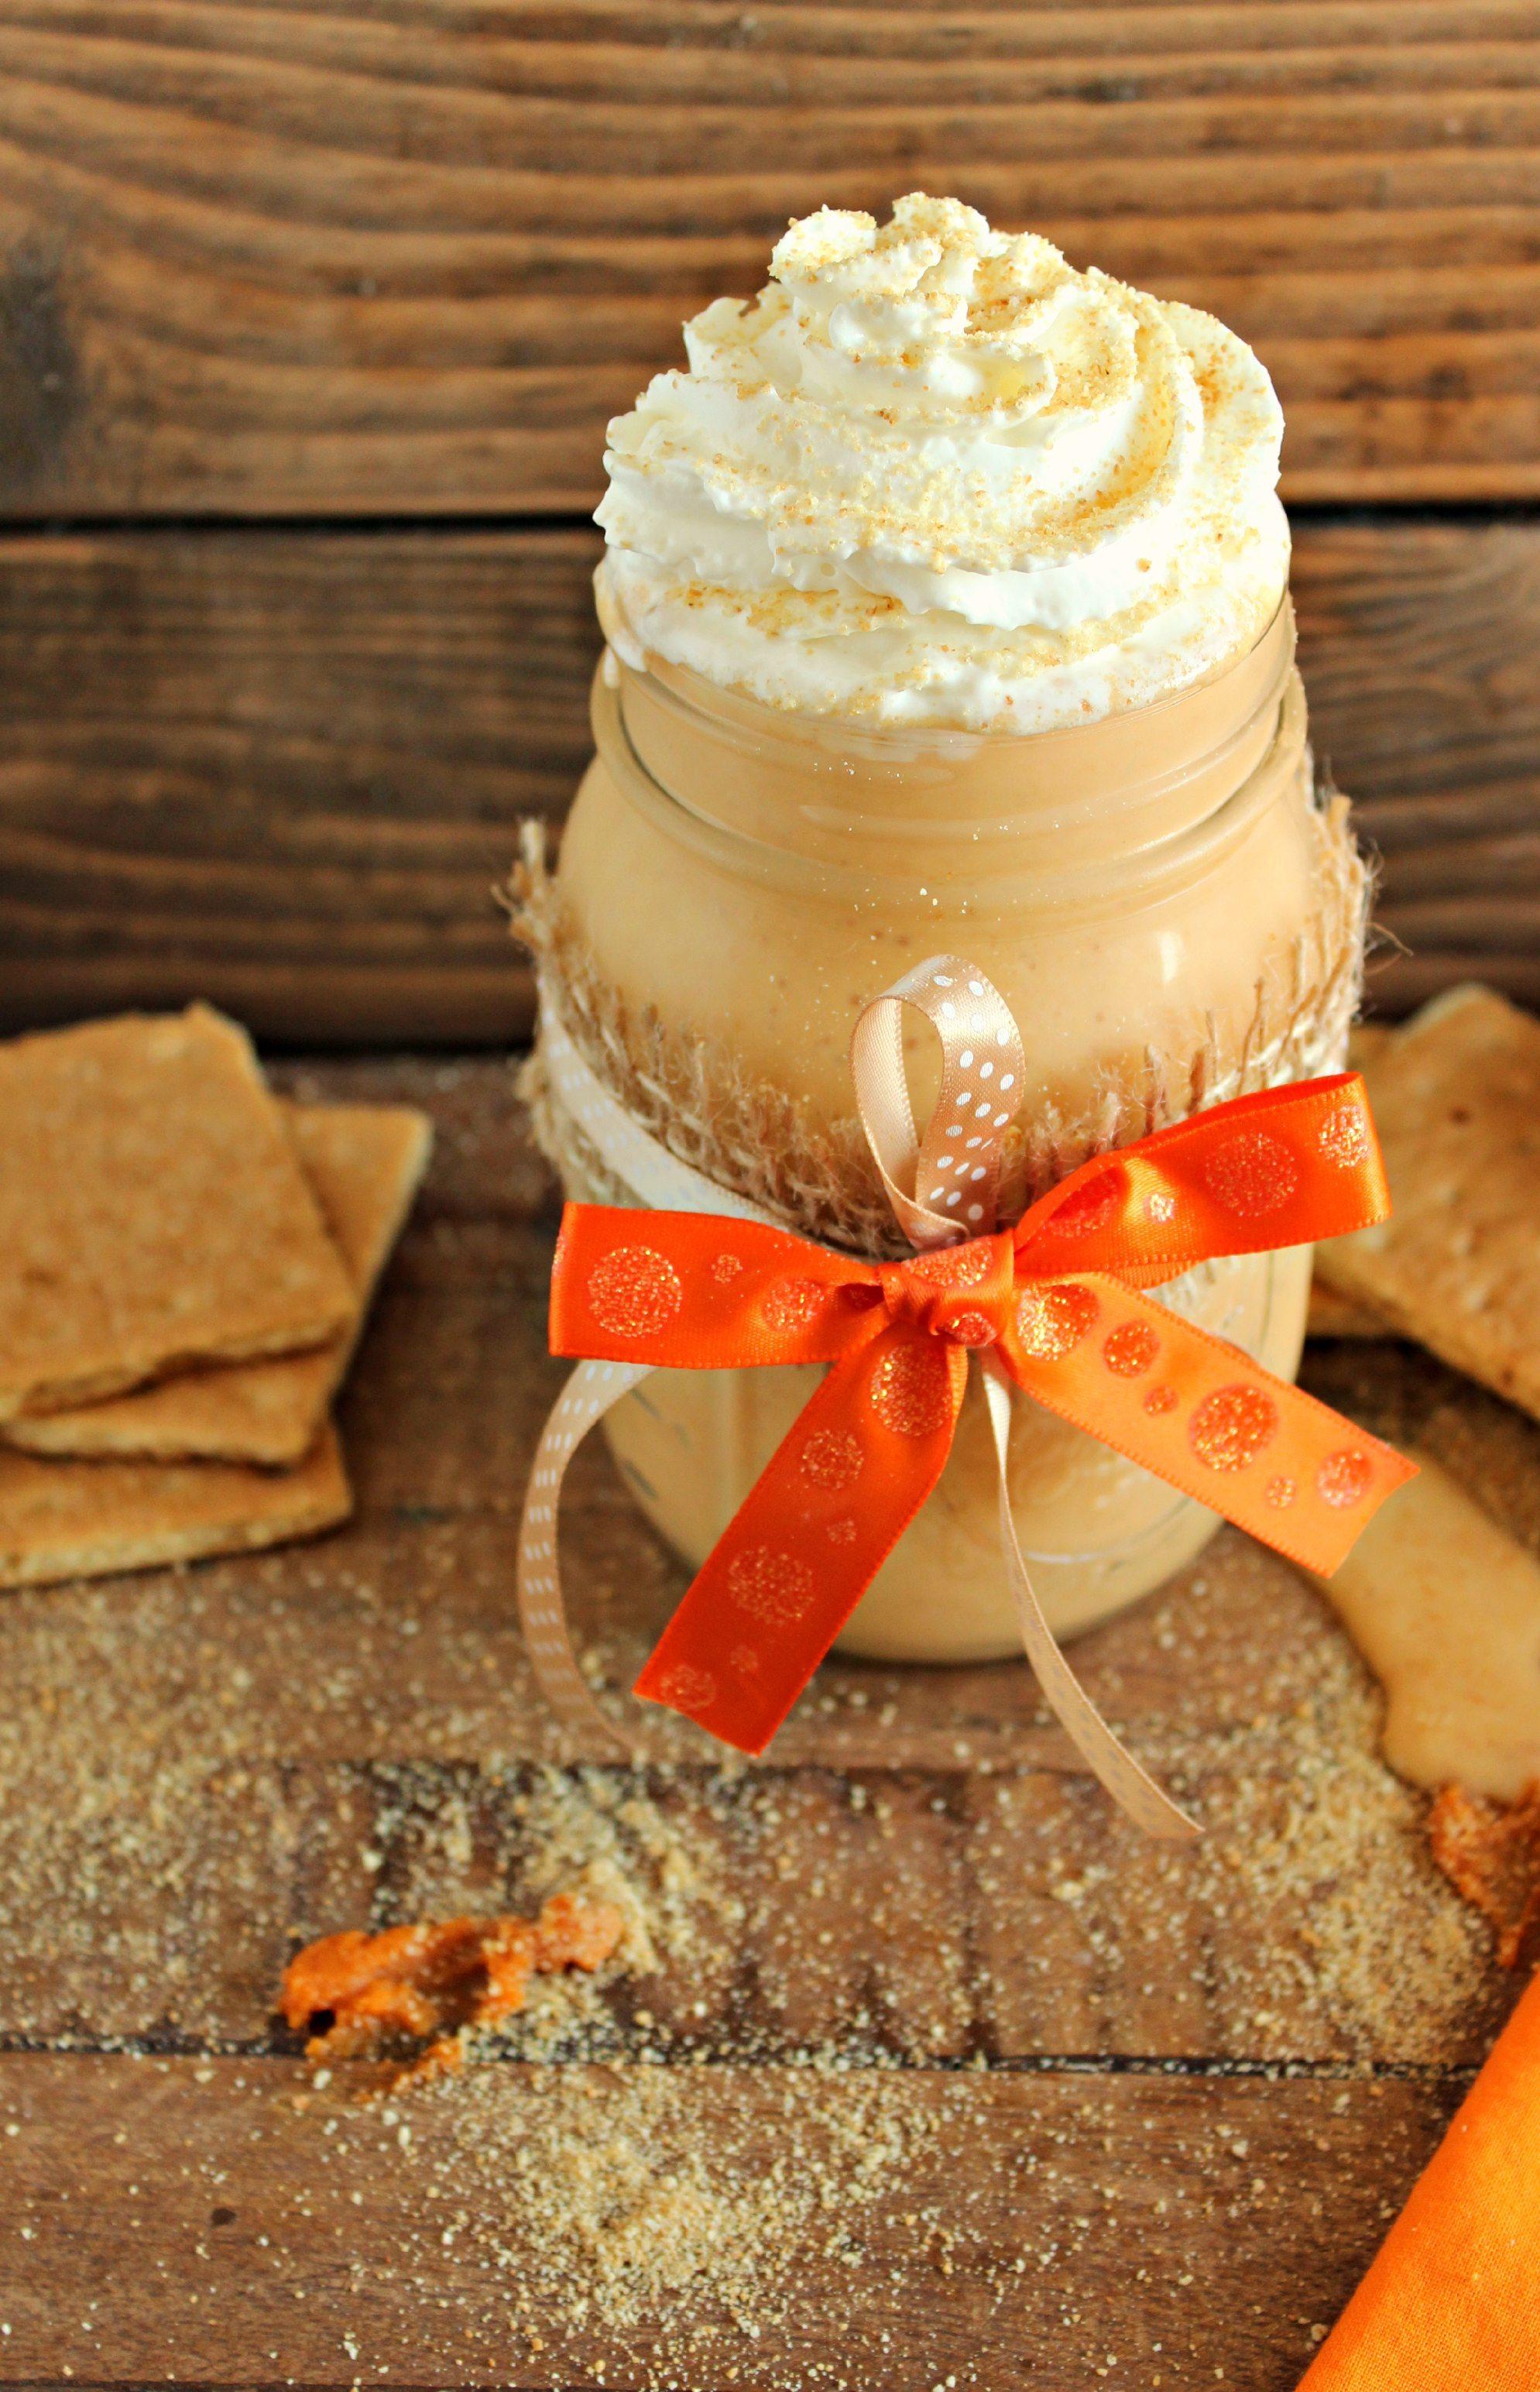 Salted Caramel and Chocolate Chip Milkshake | Healthy Chicken Recipes